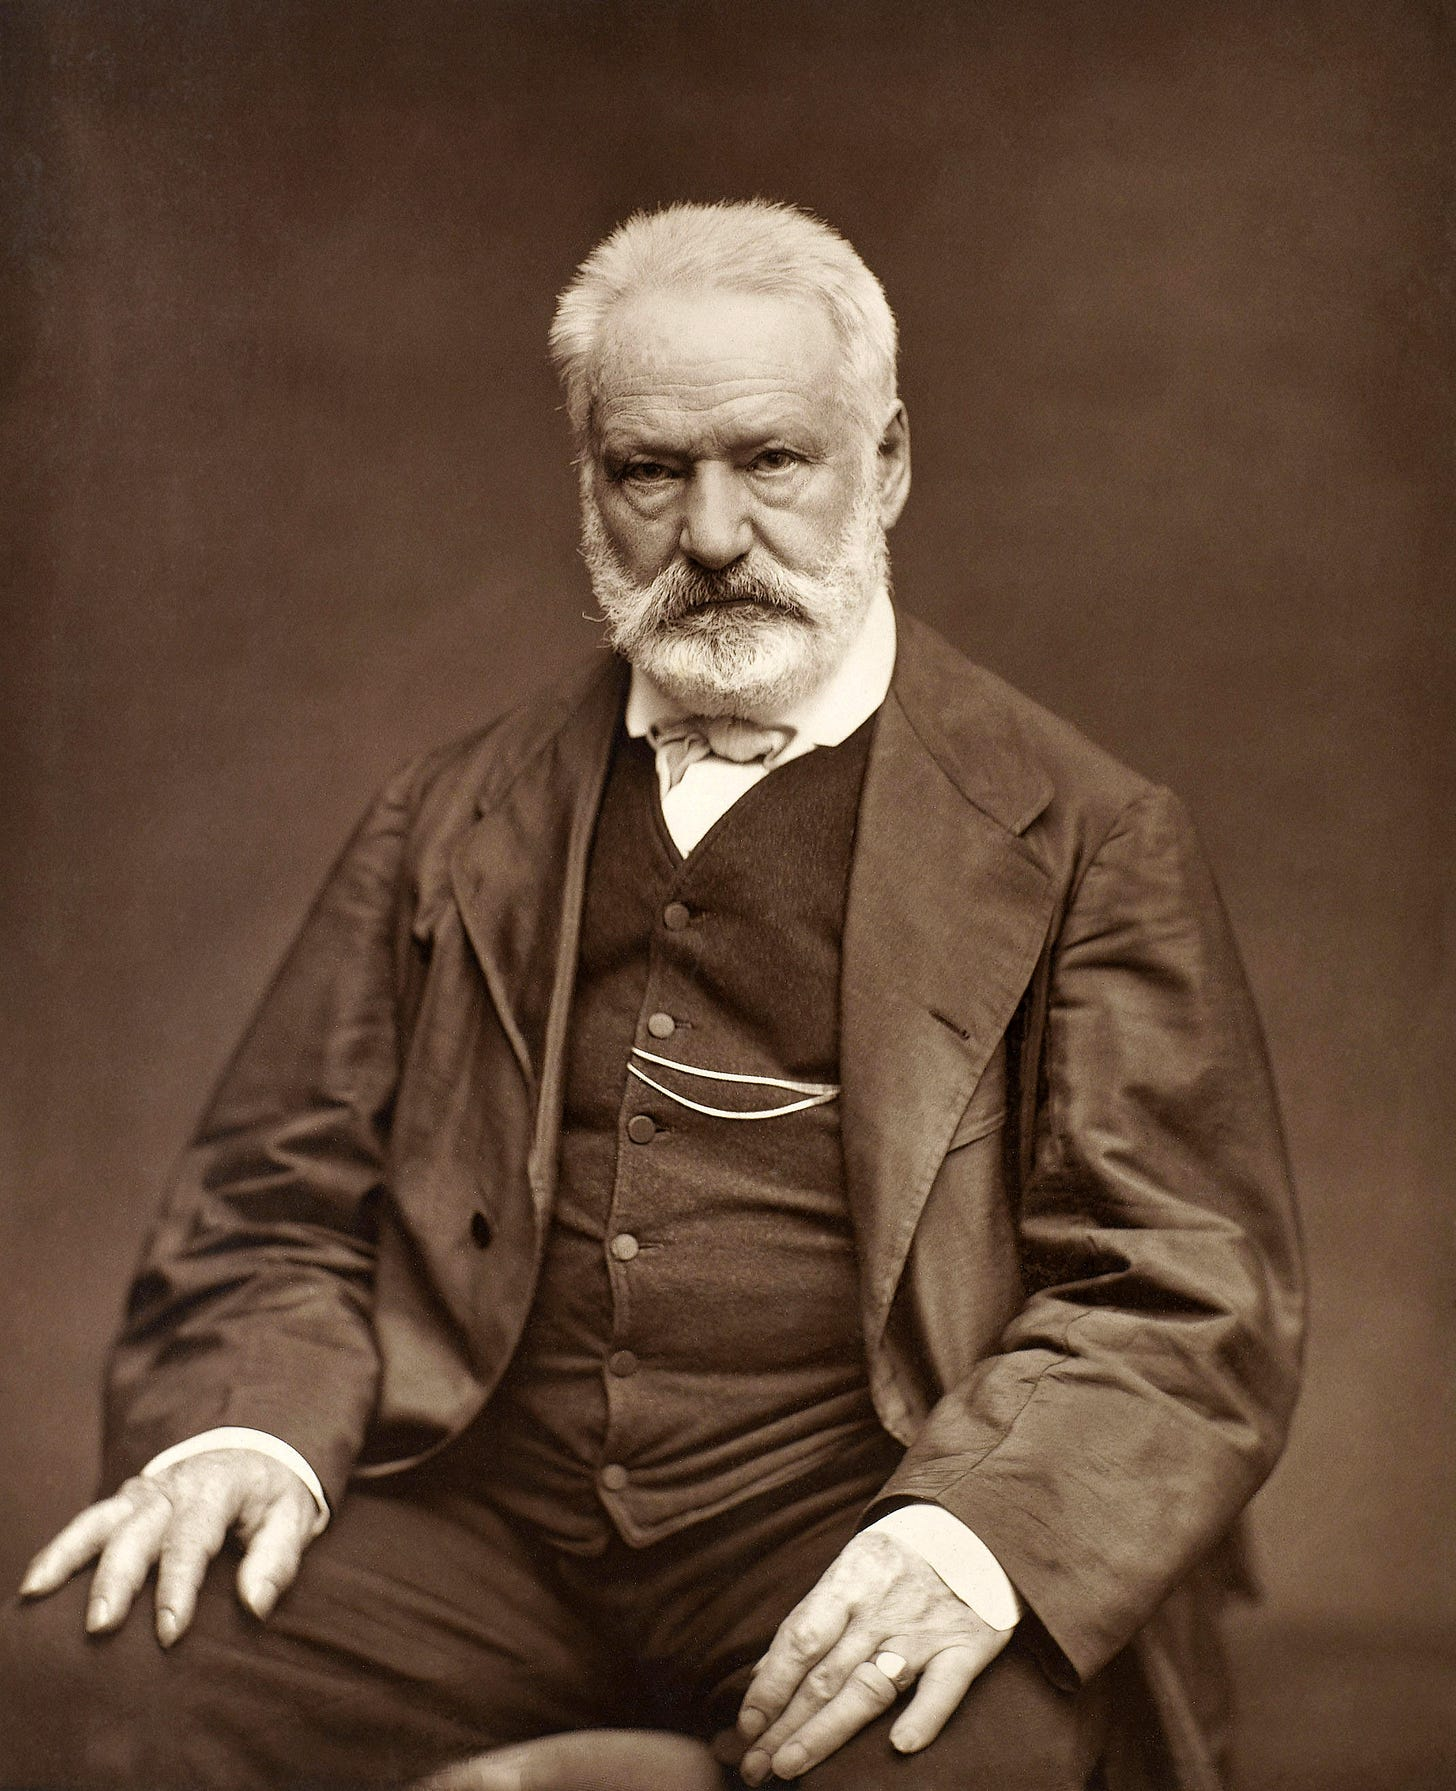 https://upload.wikimedia.org/wikipedia/commons/e/e6/Victor_Hugo_by_%C3%89tienne_Carjat_1876_-_full.jpg